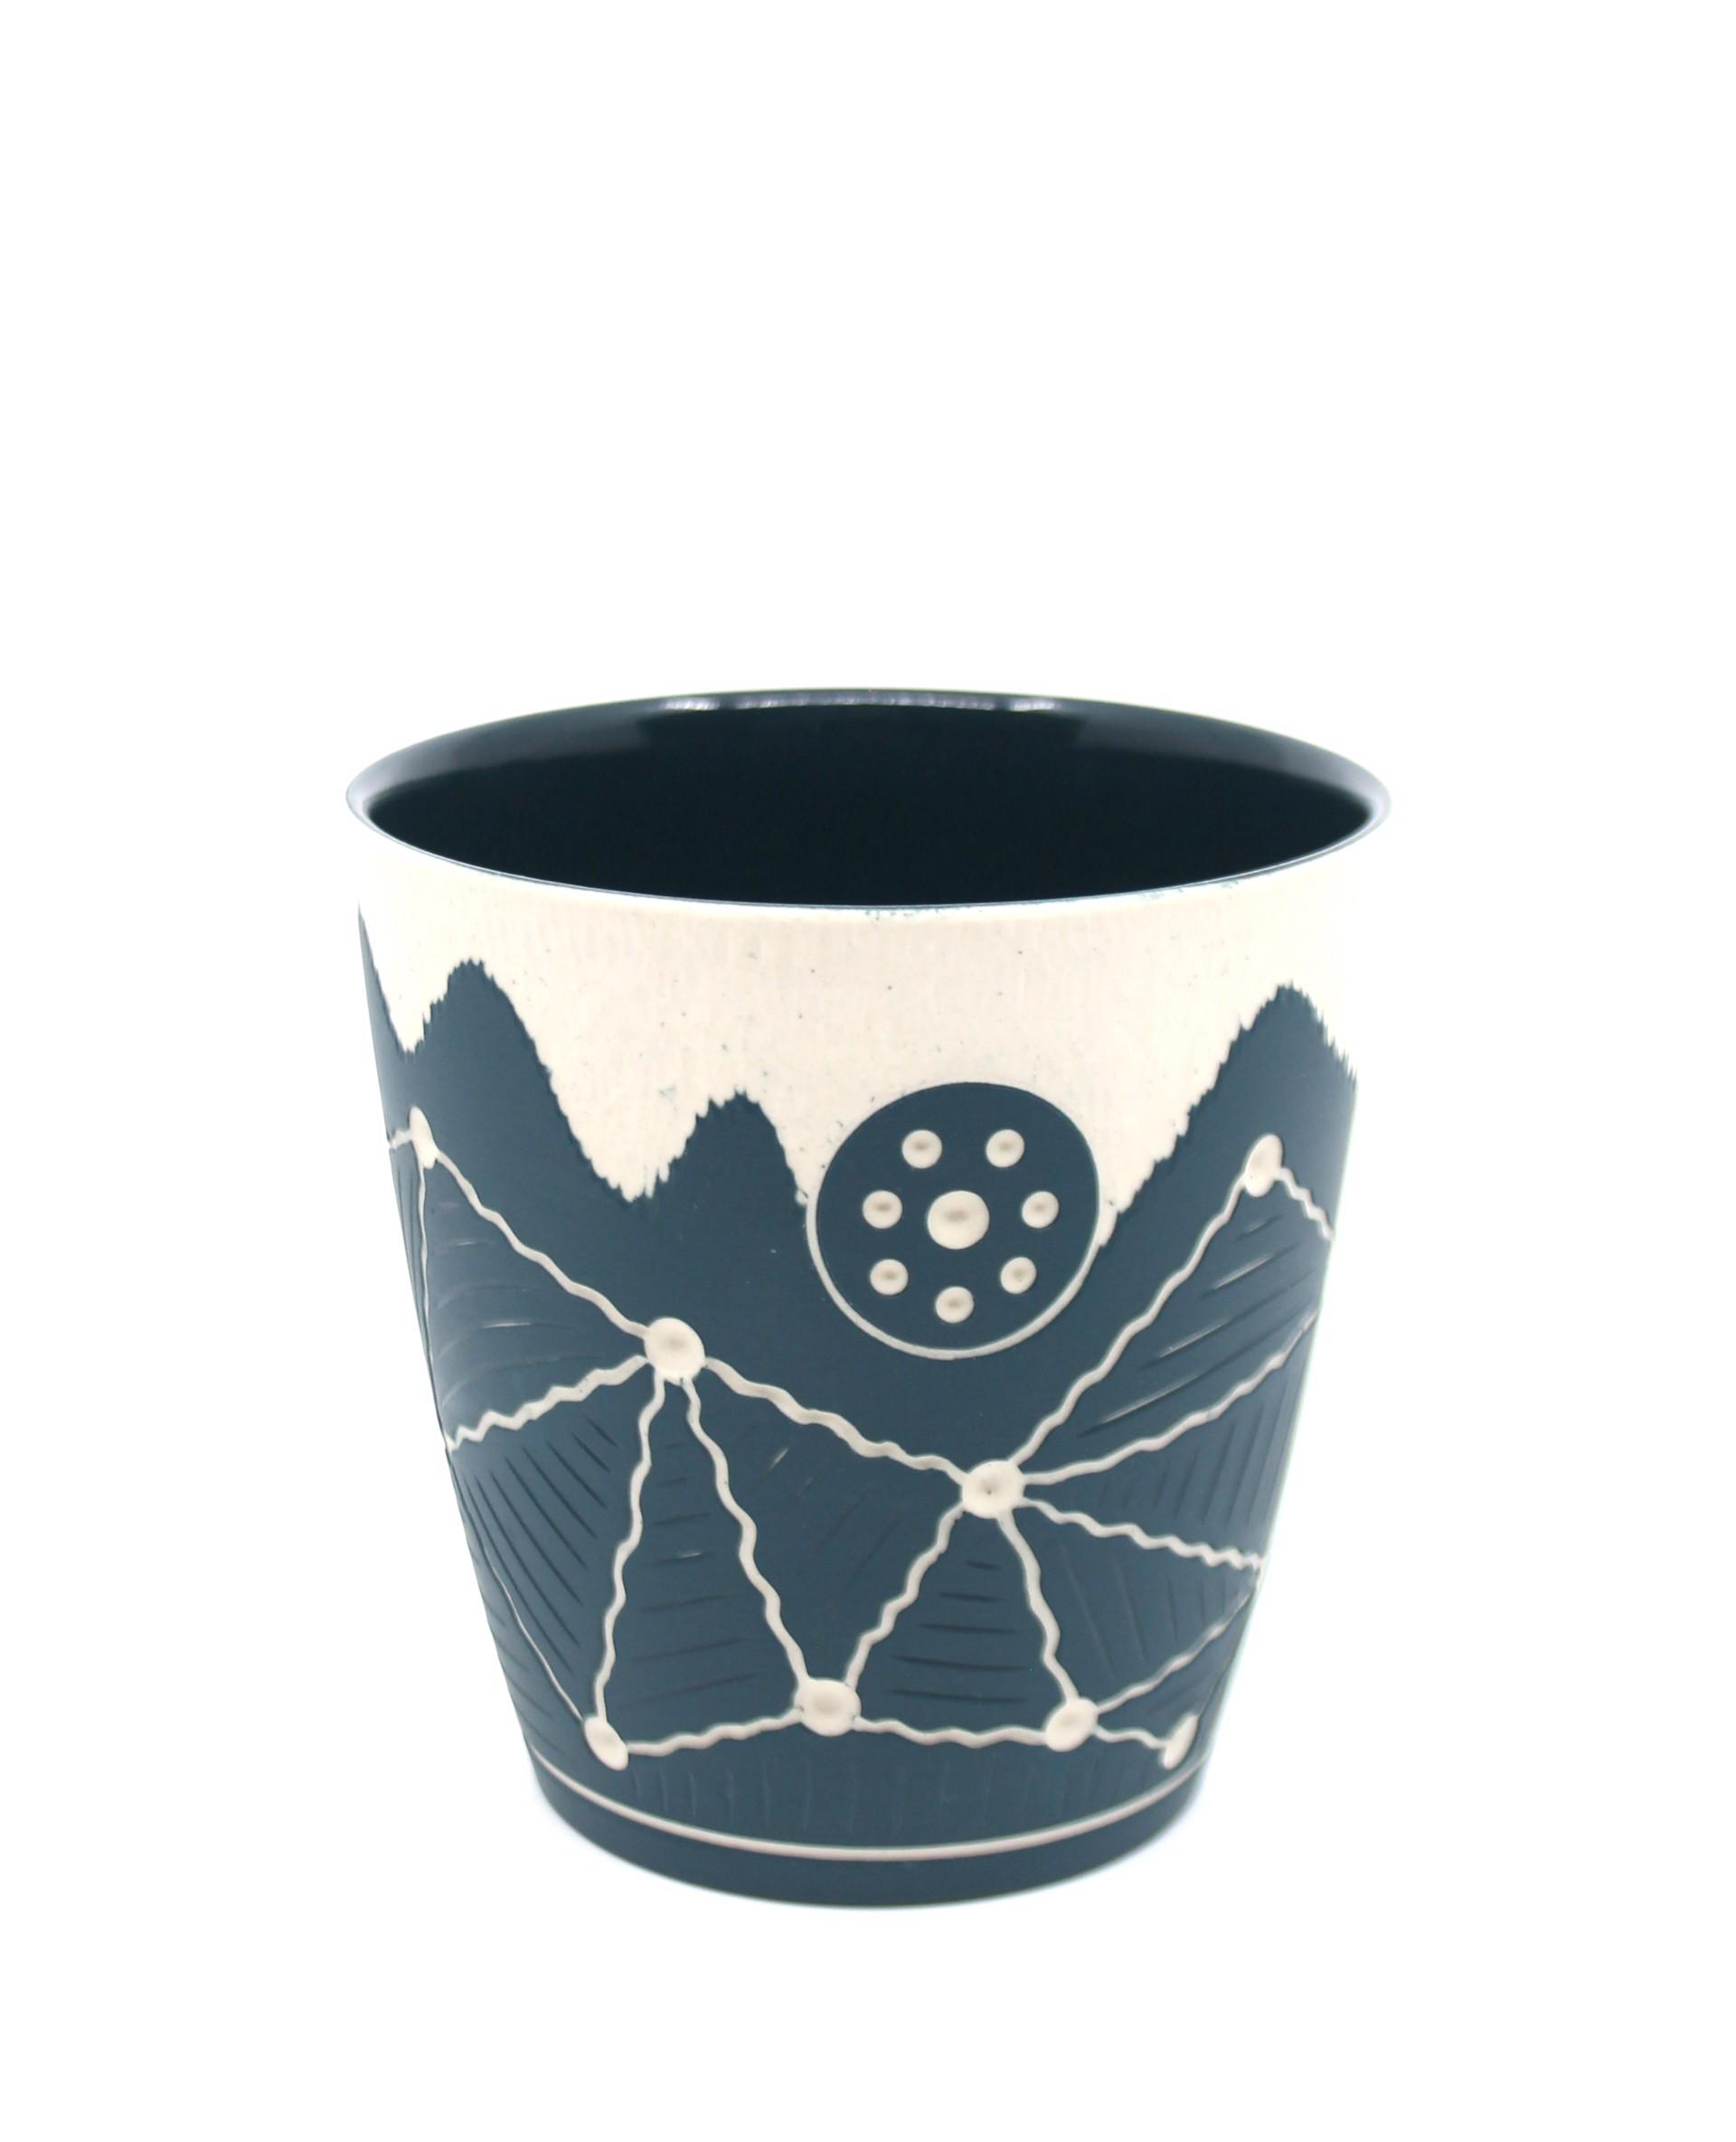 Dark Green Cup by Chris Casey